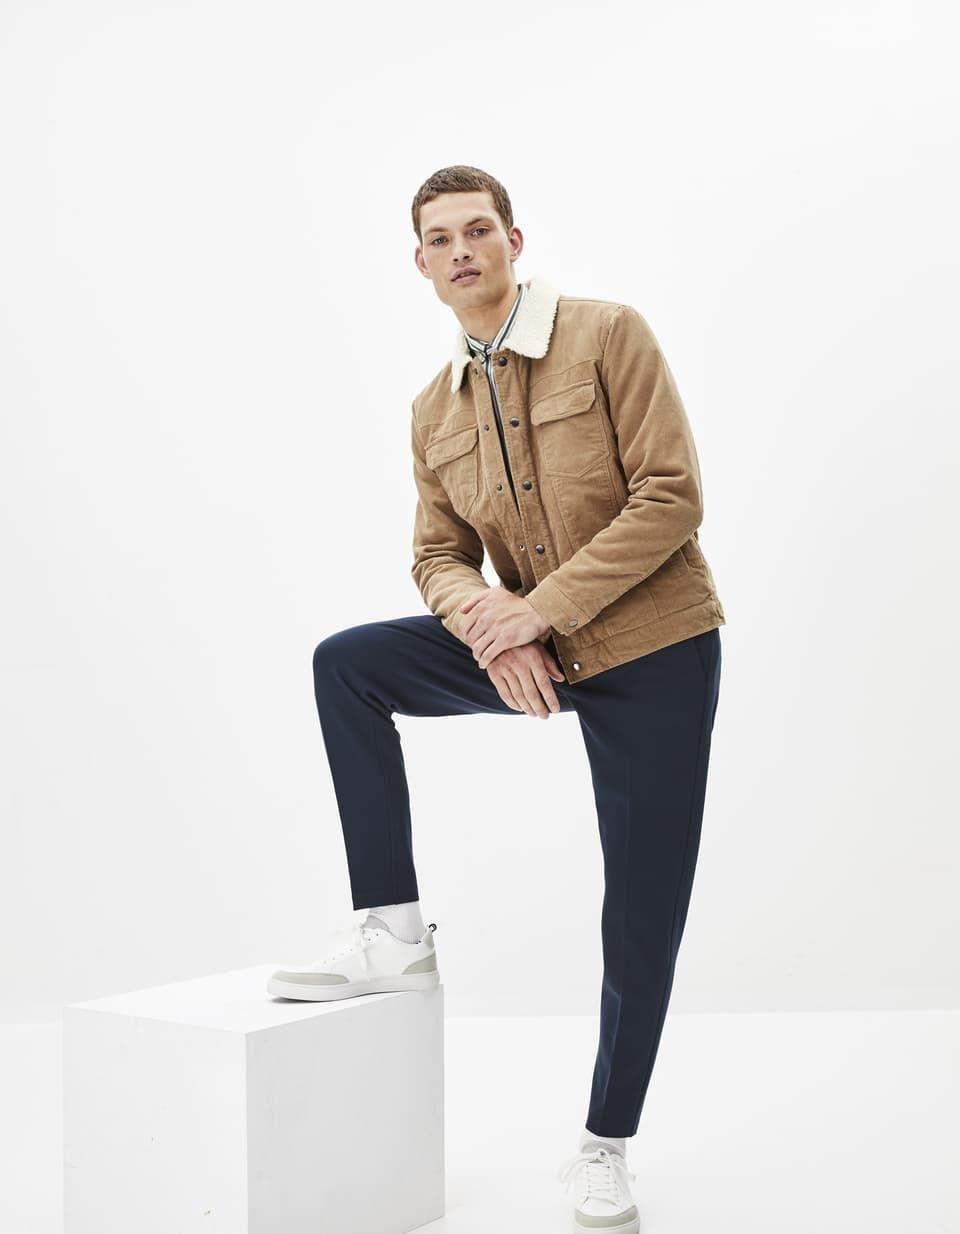 Pantalon Homme 24H slim Celio France | Pantalon sport